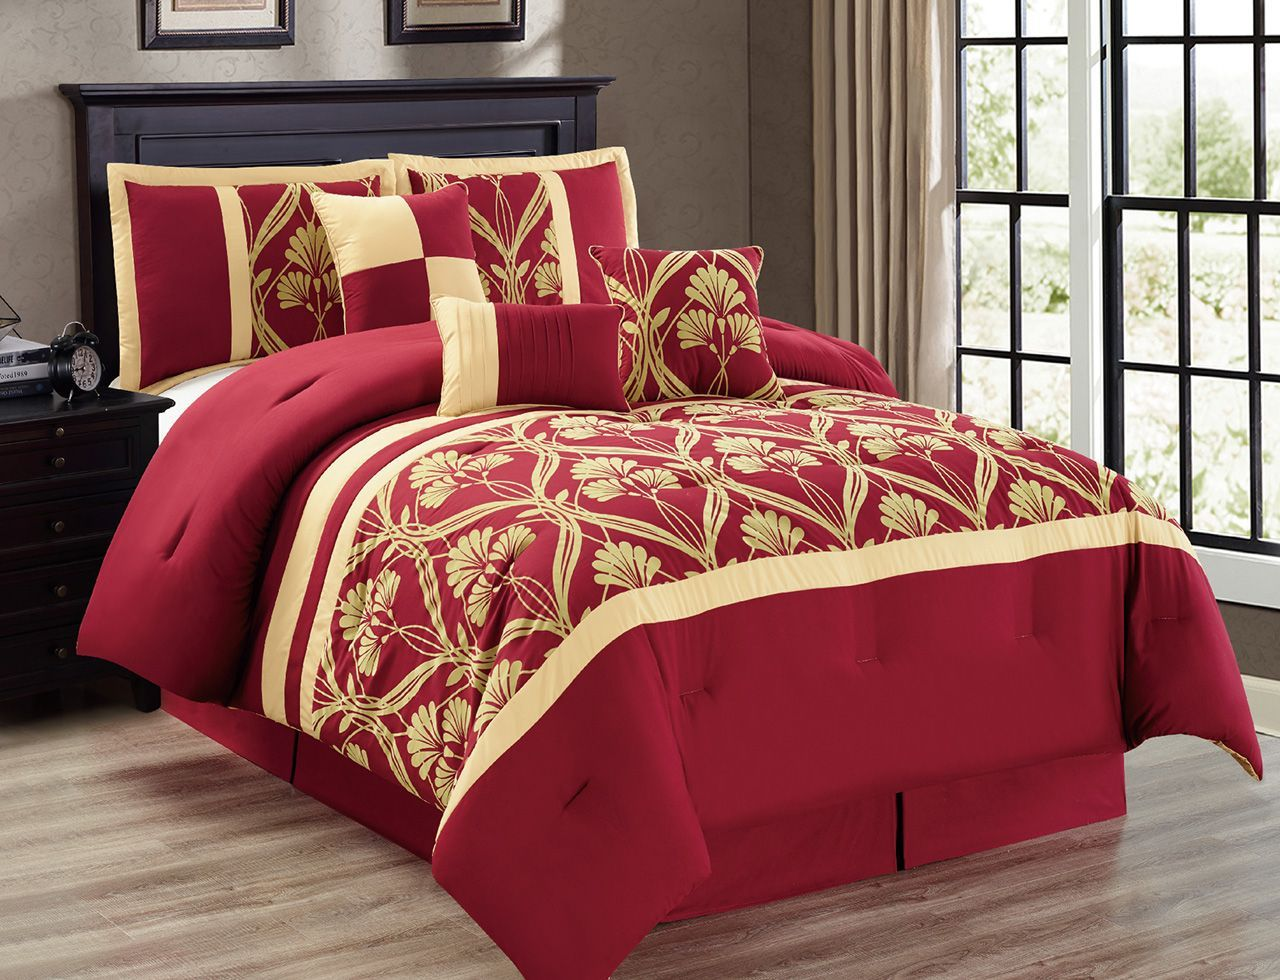 Beautiful 7 Piece Perris Burgundy/Gold Comforter Set